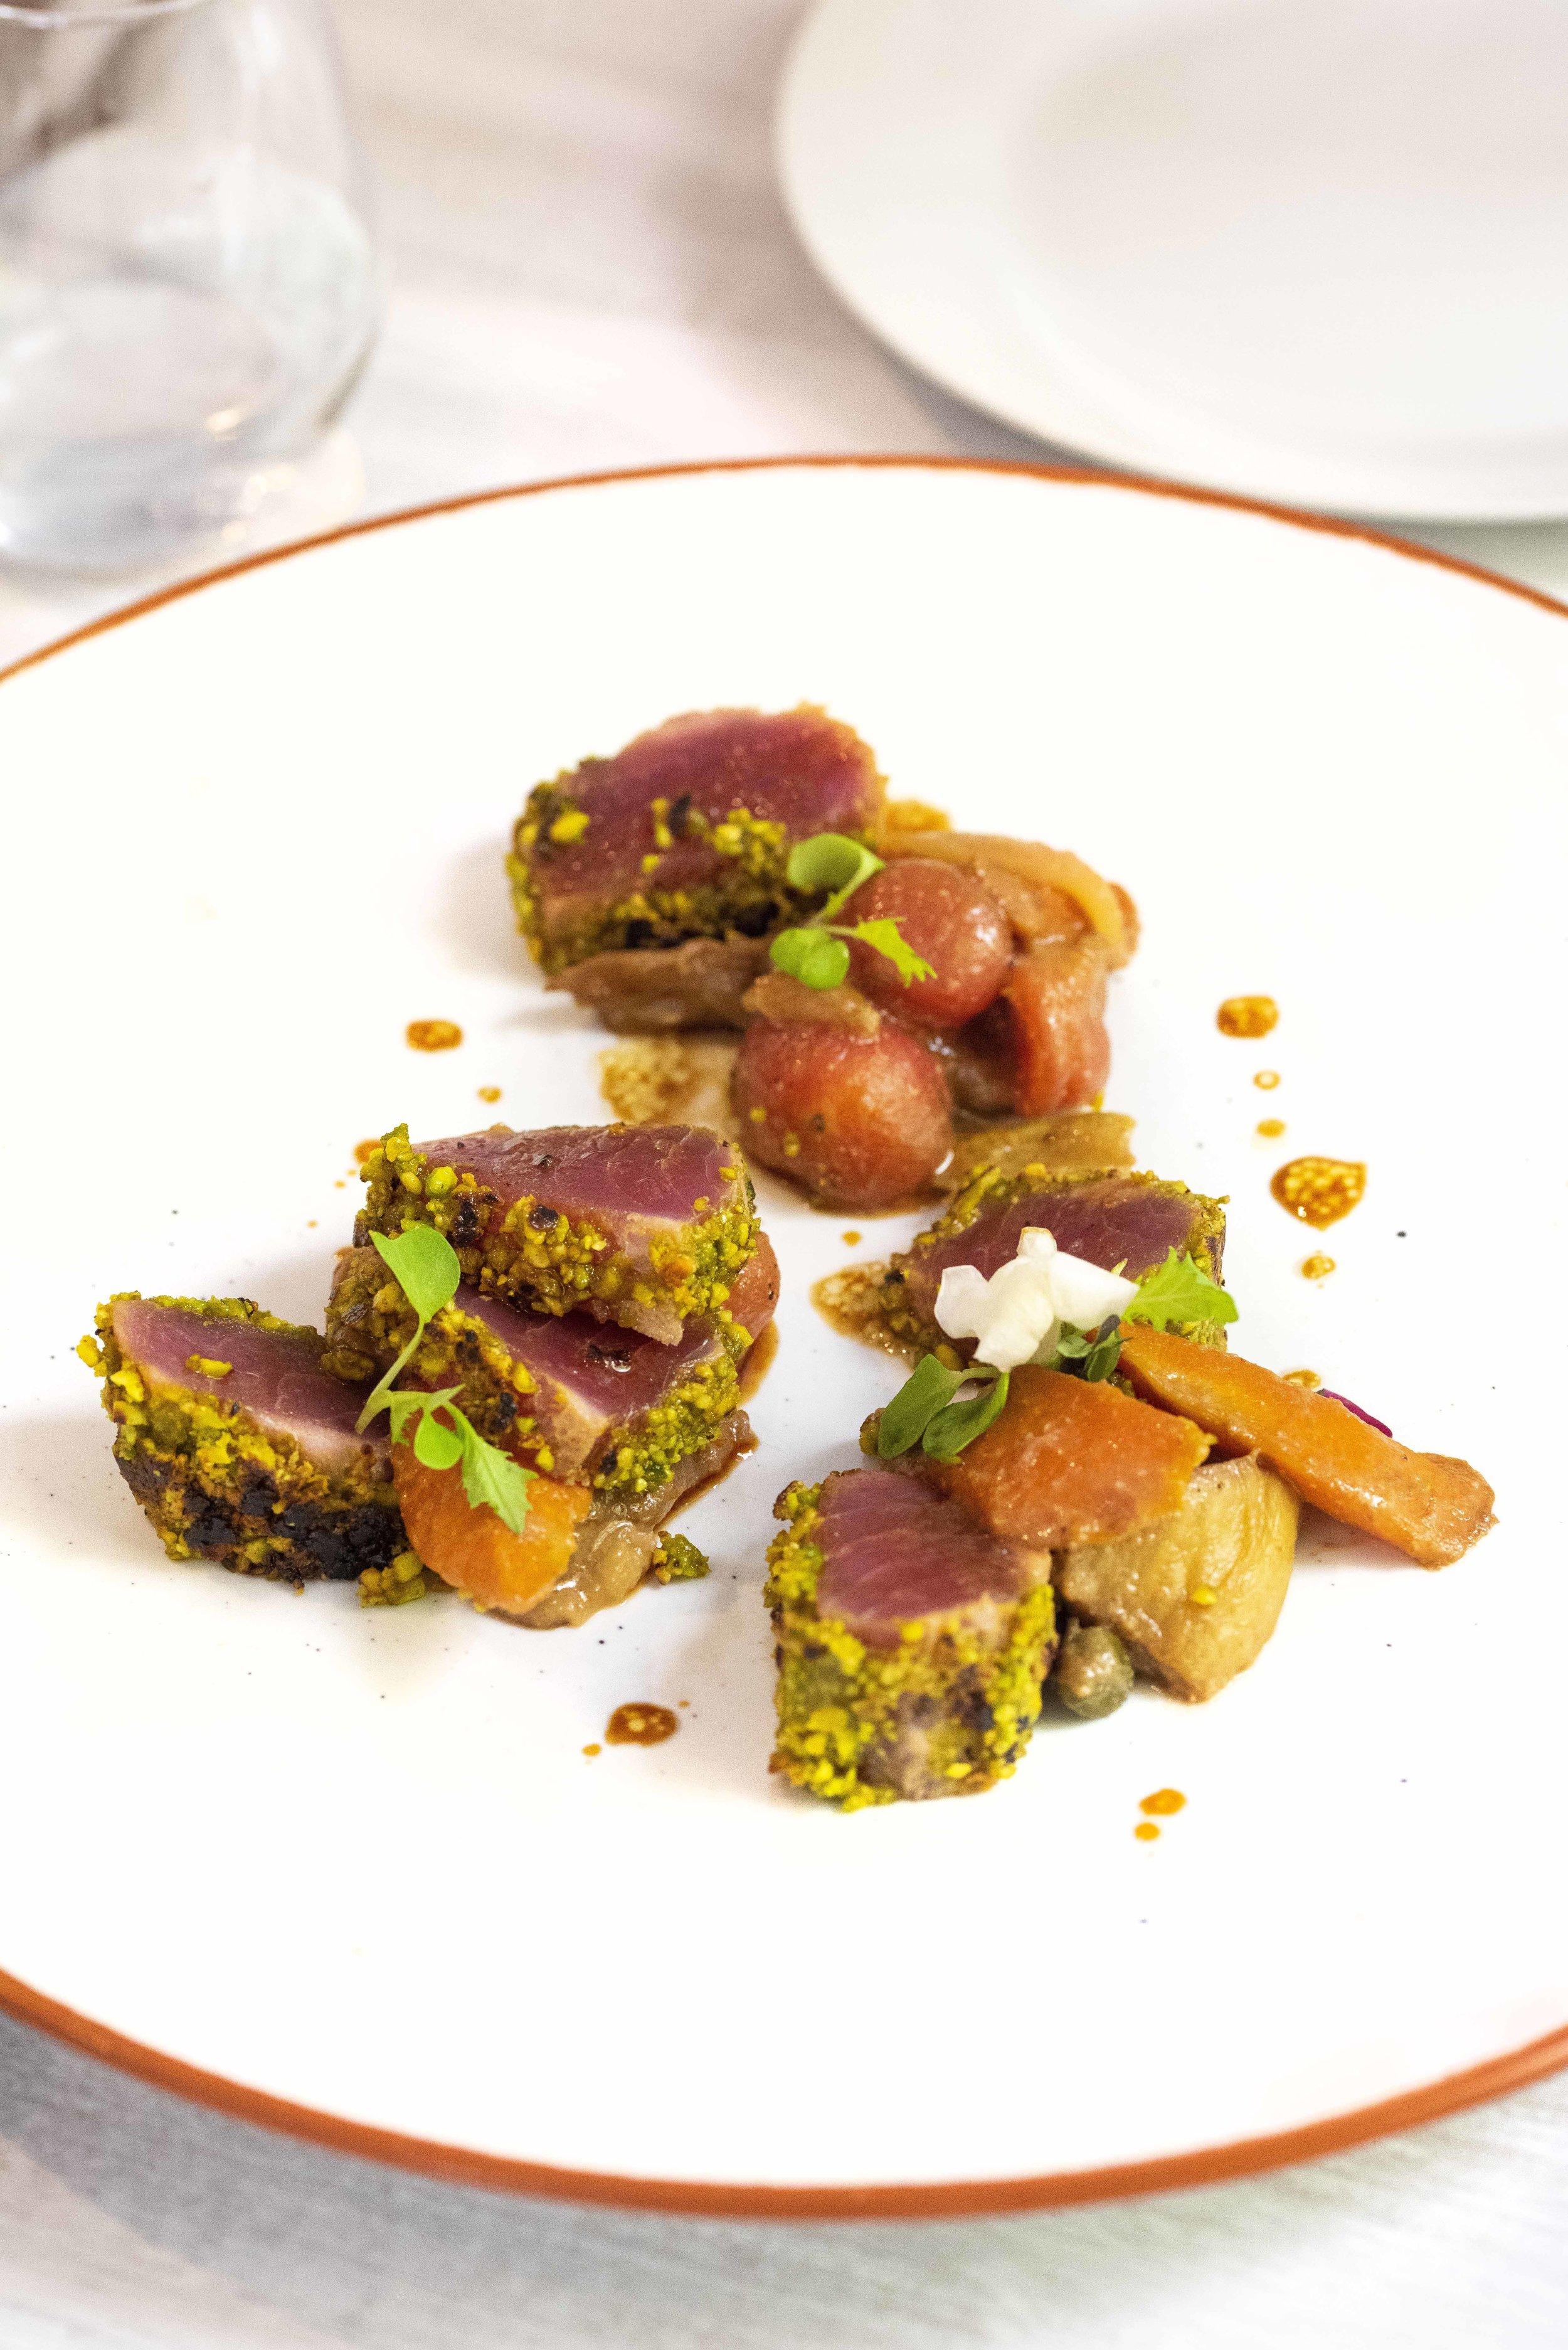 The Fastuc signature dish: tuna with a miso caponata. Restaurant Fastuc, Barcelona. Photo © Barcelona Food Experience.